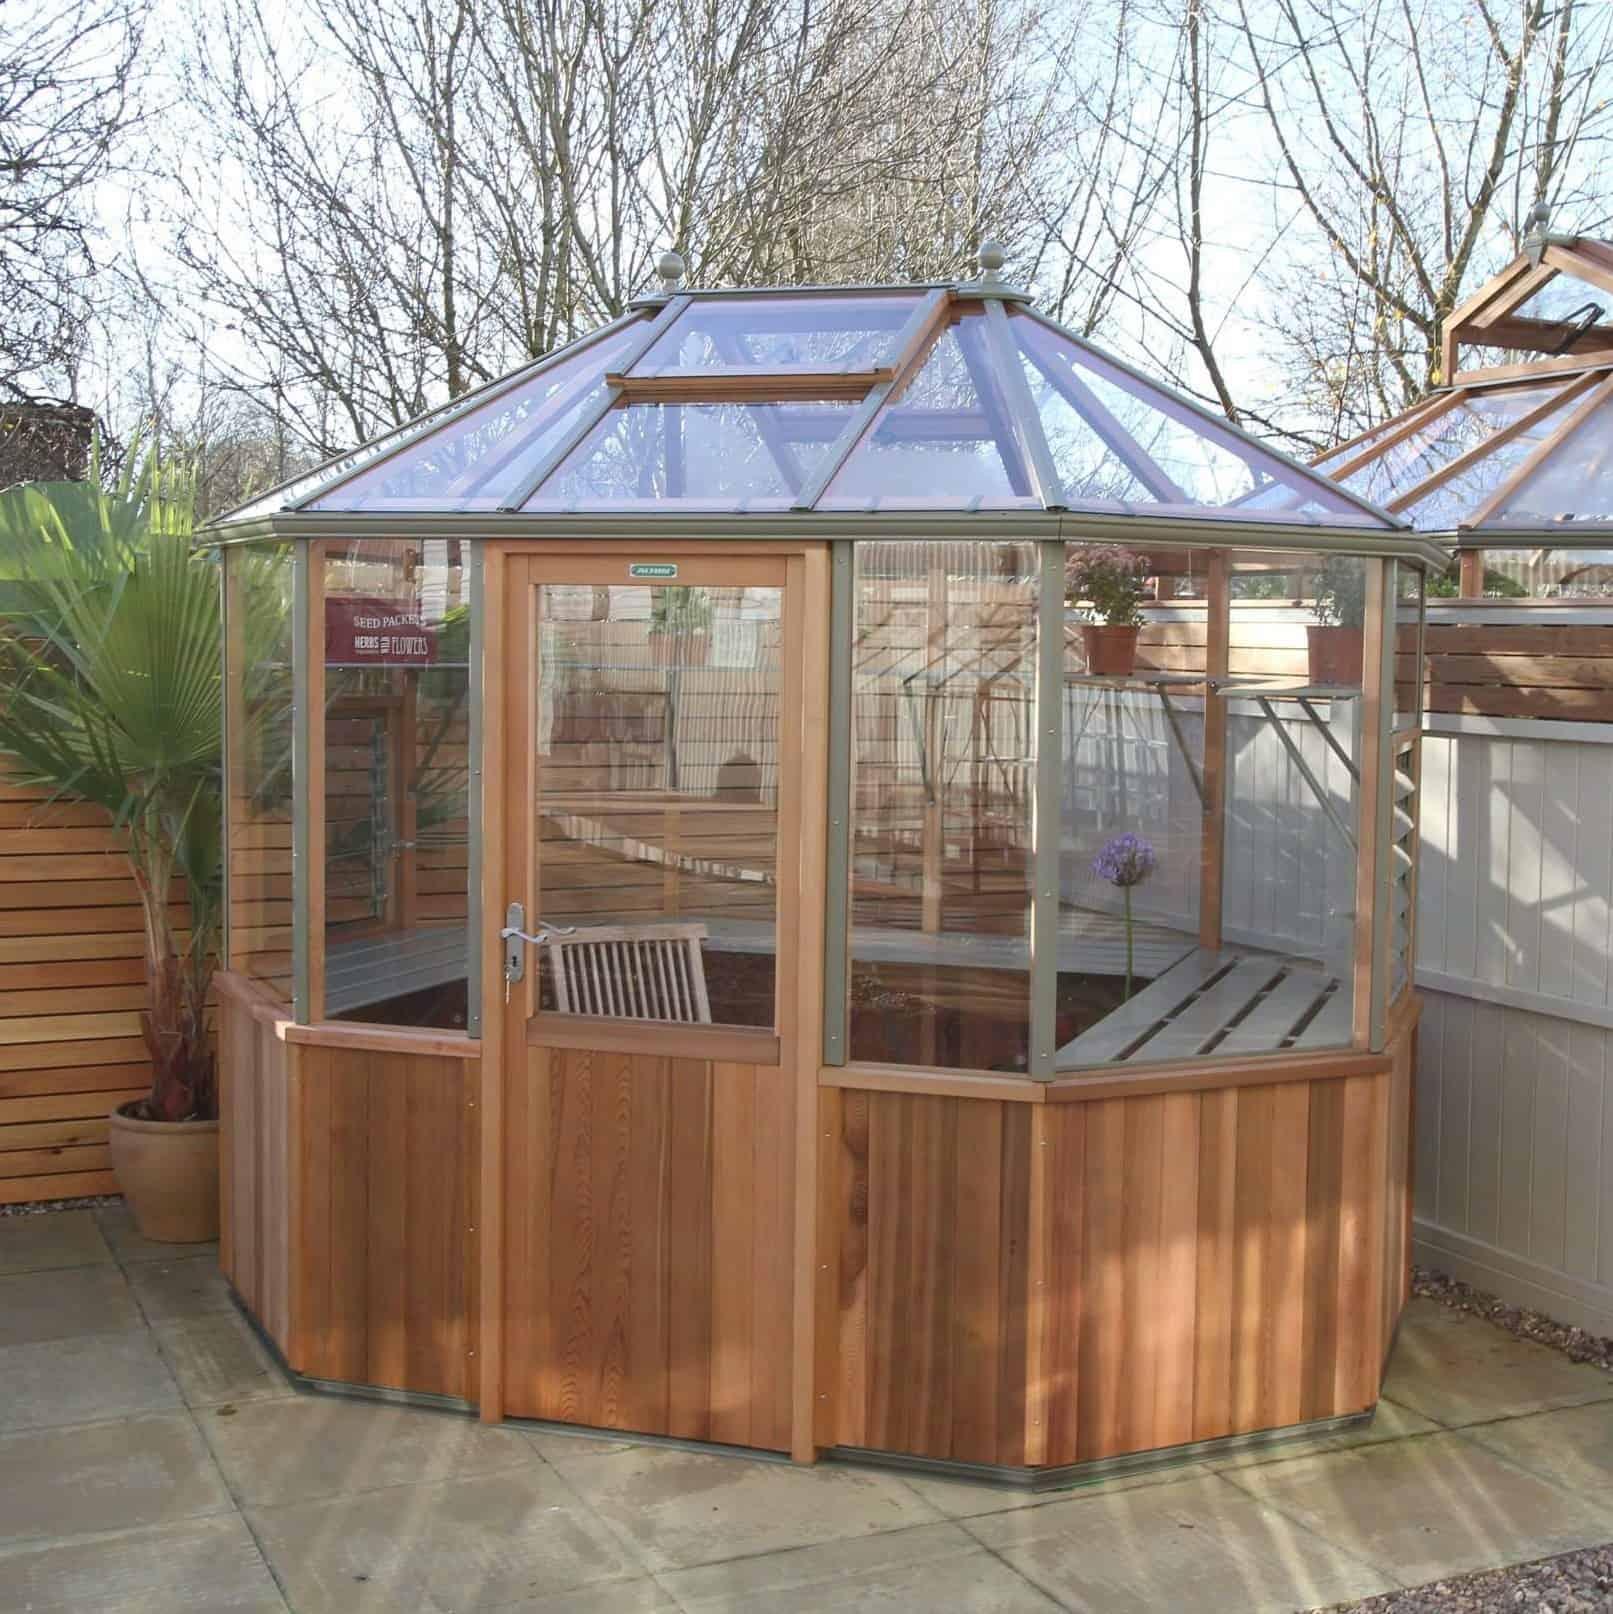 Alton Octagonal Cedar Greenhouse 6 x 9